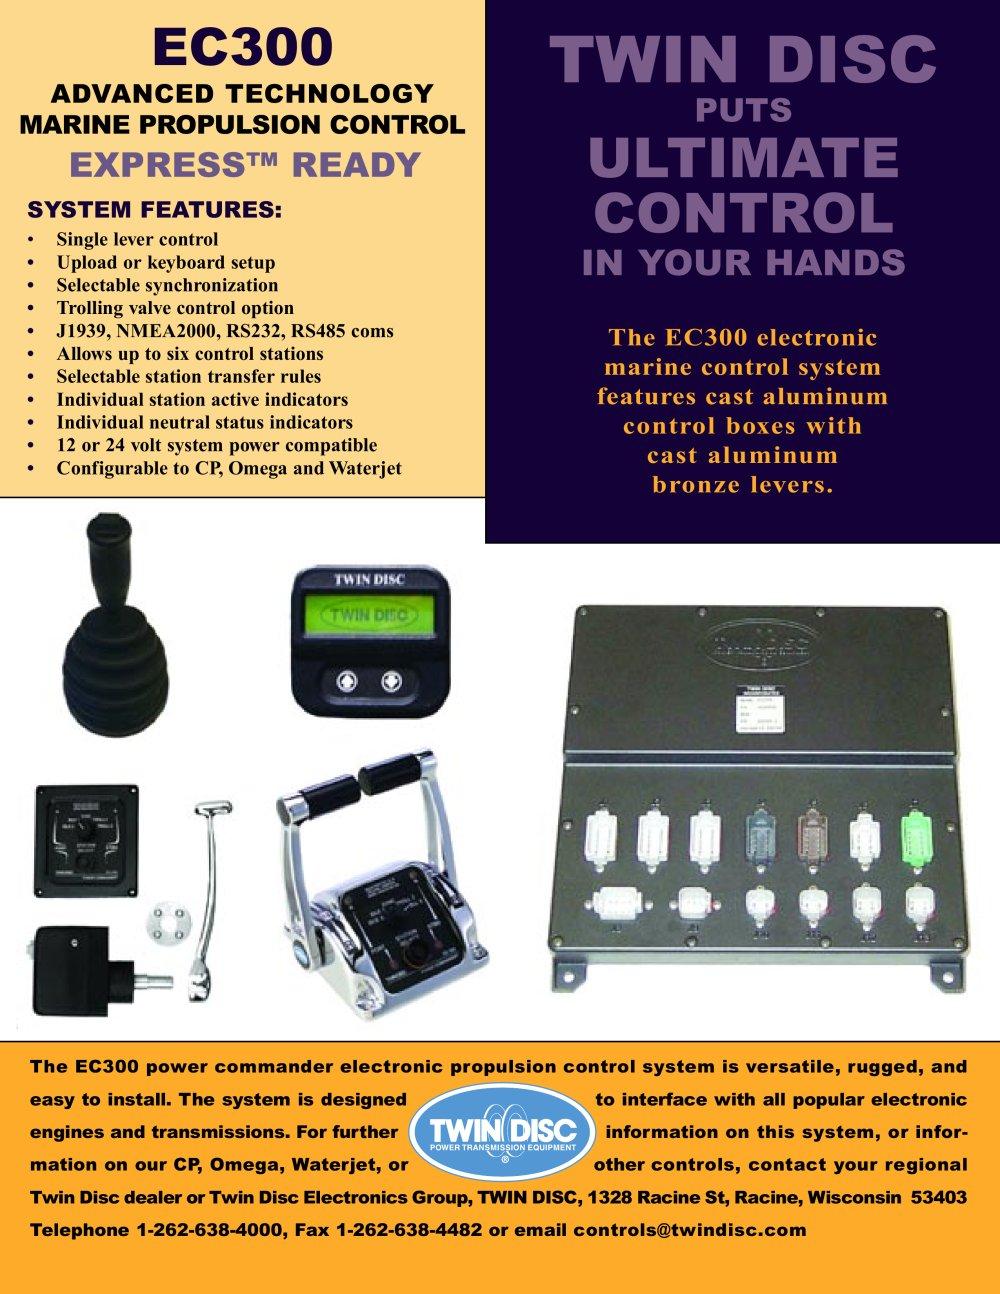 twin disc ec300 electronic controls twin disc pdf catalogue rh pdf directindustry com twin disc ec300 operator's manual Medtronic EC300